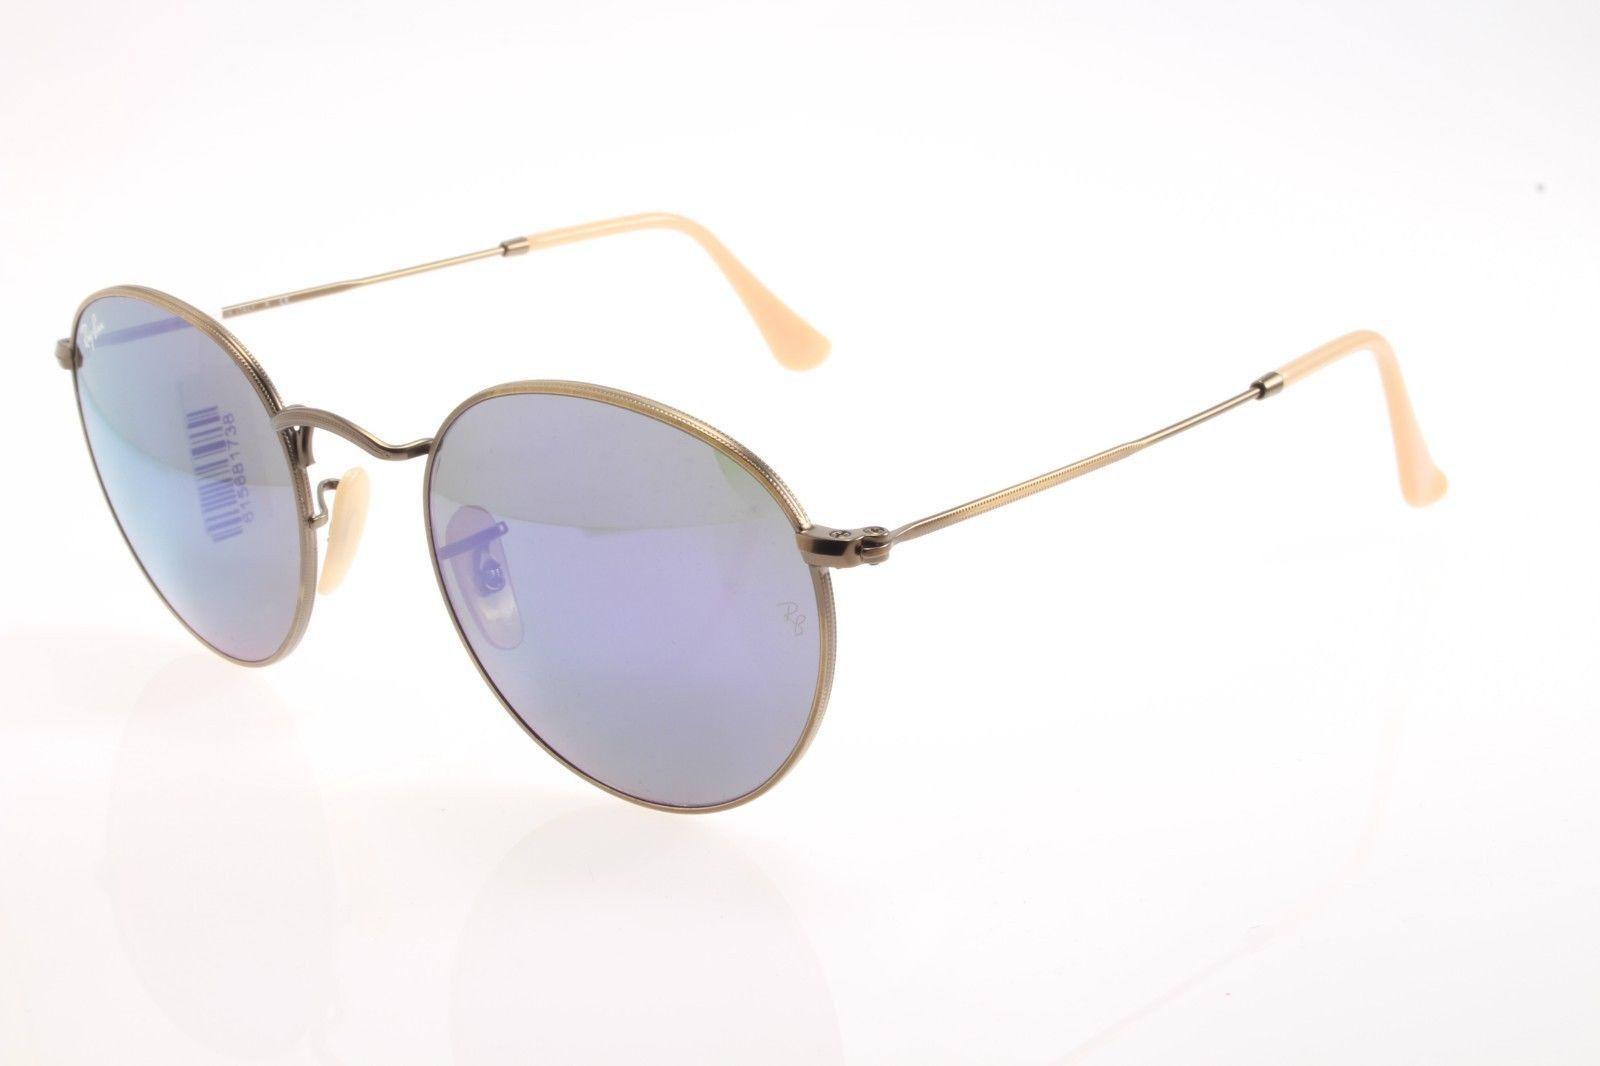 8b61b5067eb New original sunglasses Ray Ban RB 3447 167 68 50 Round Bronze Blue mirrored